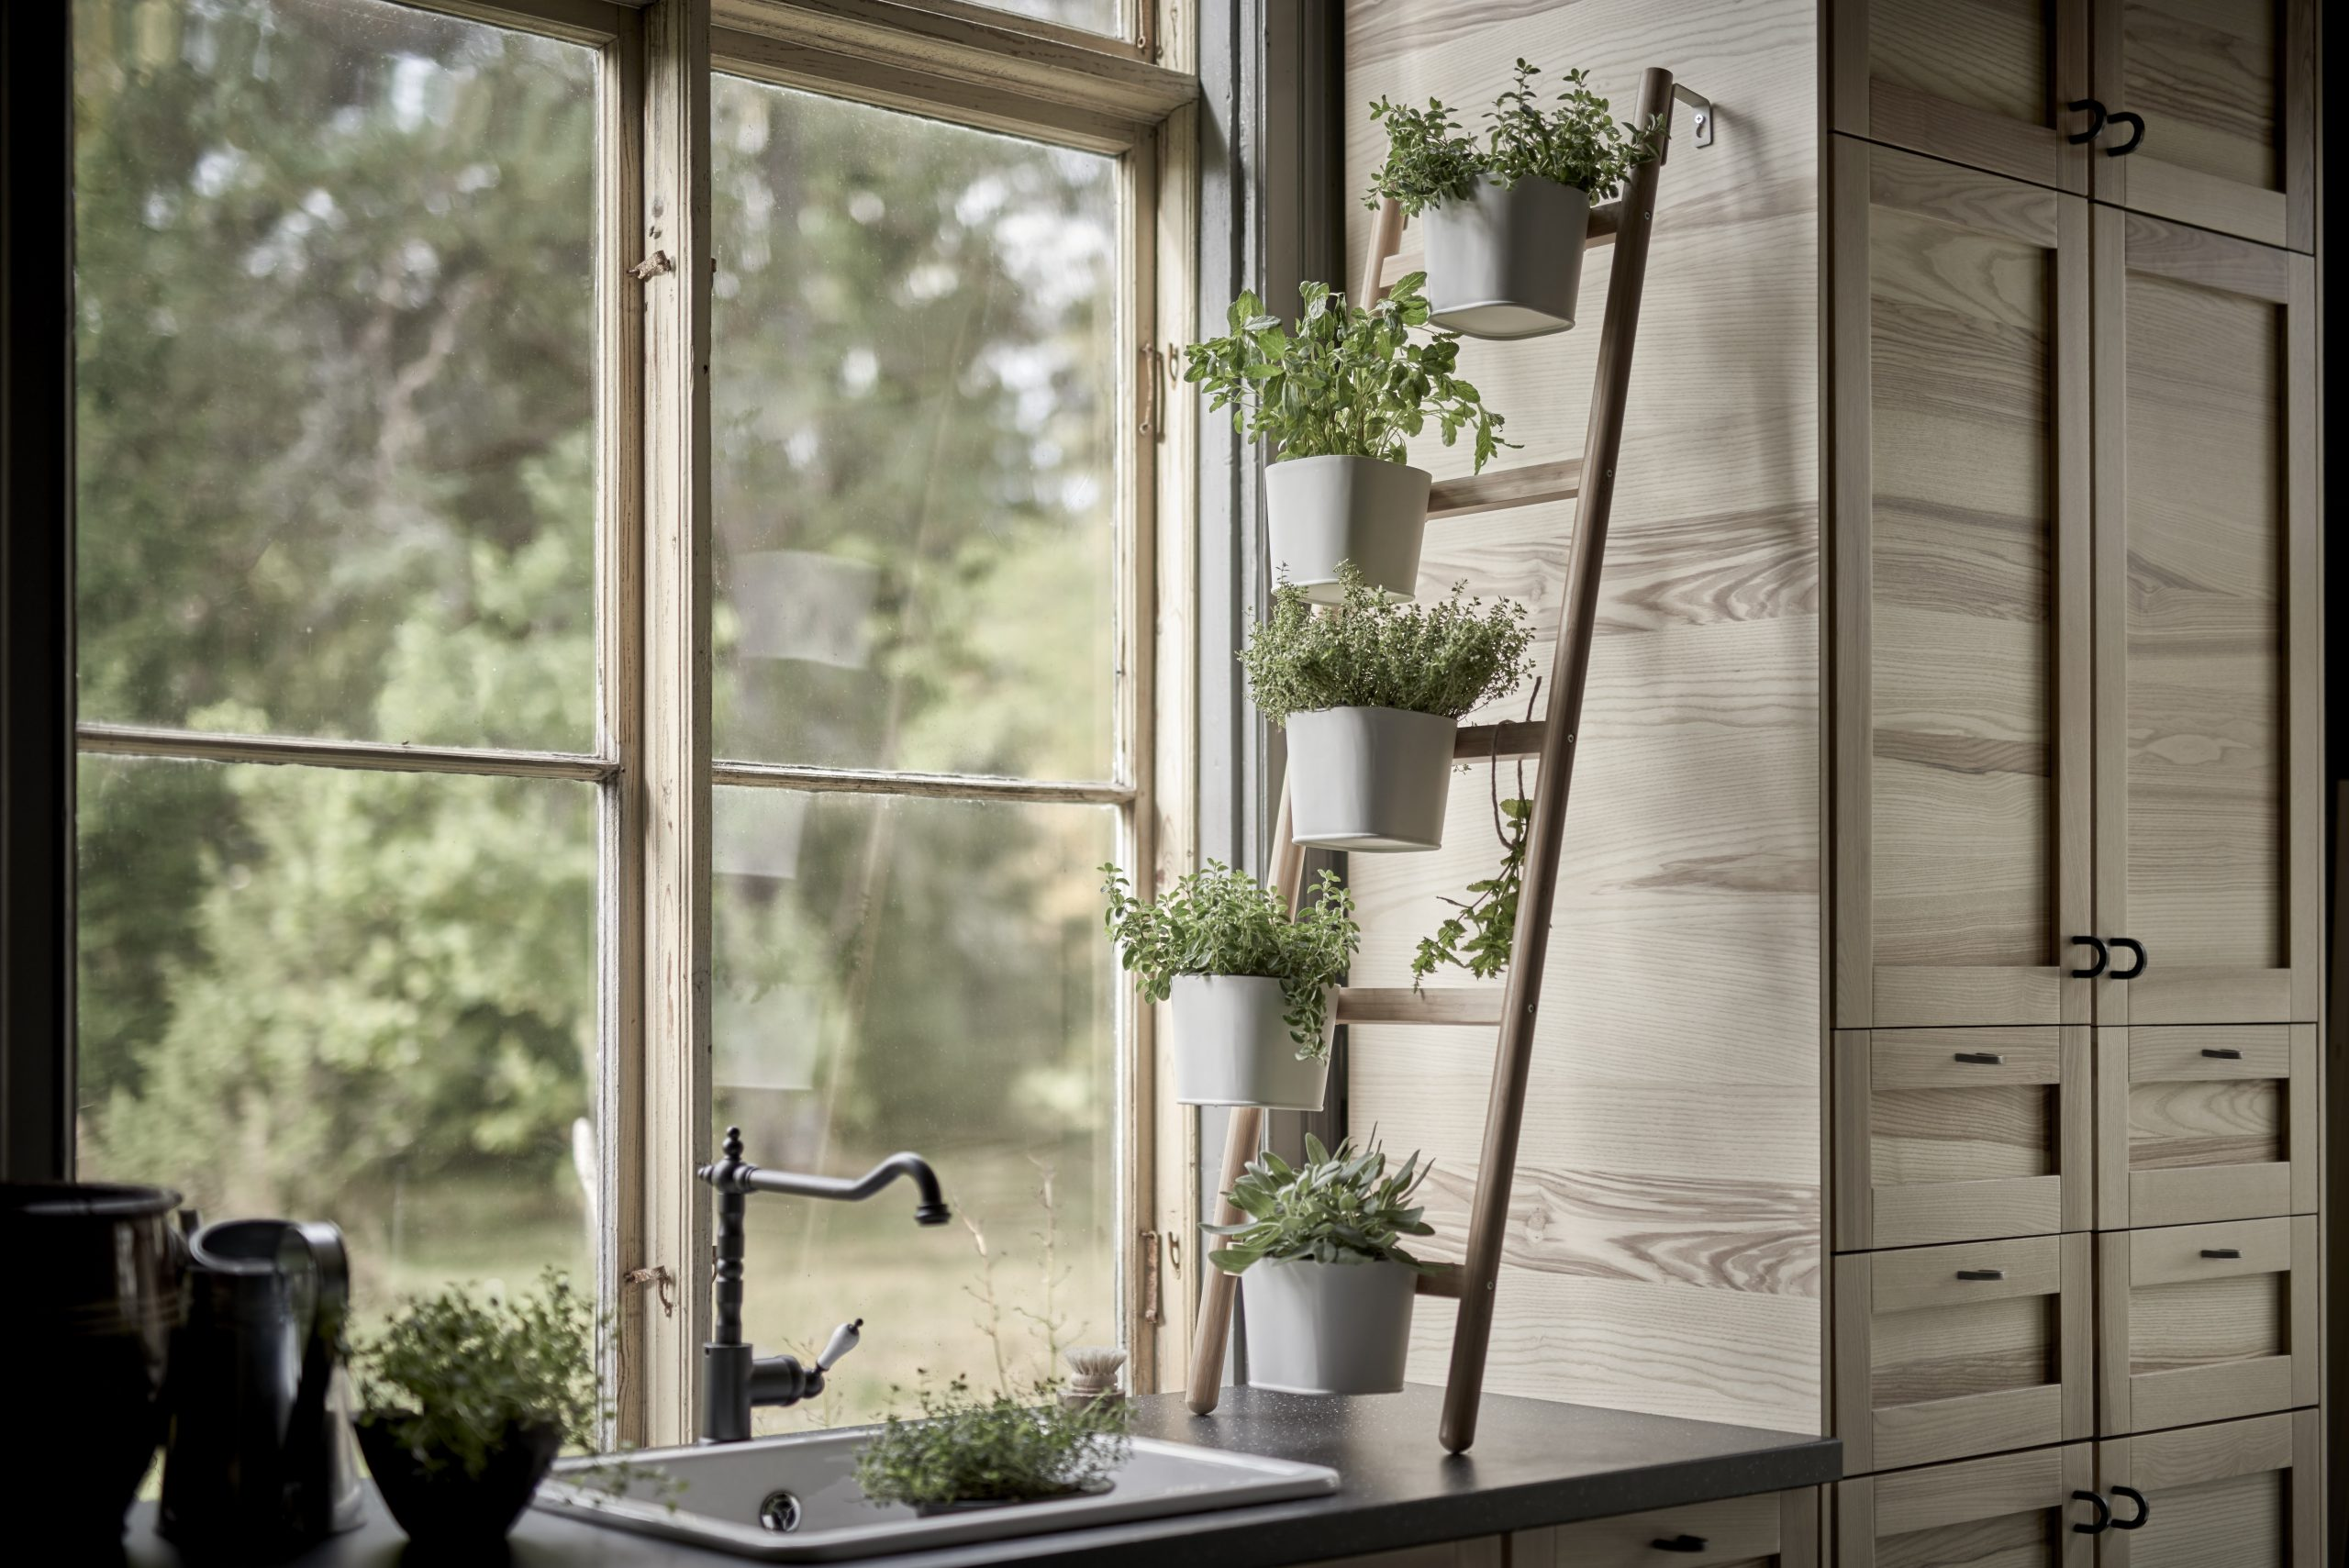 Simphome.com 5 indoor herb garden ideas for your kitchen architectural digest in 2020